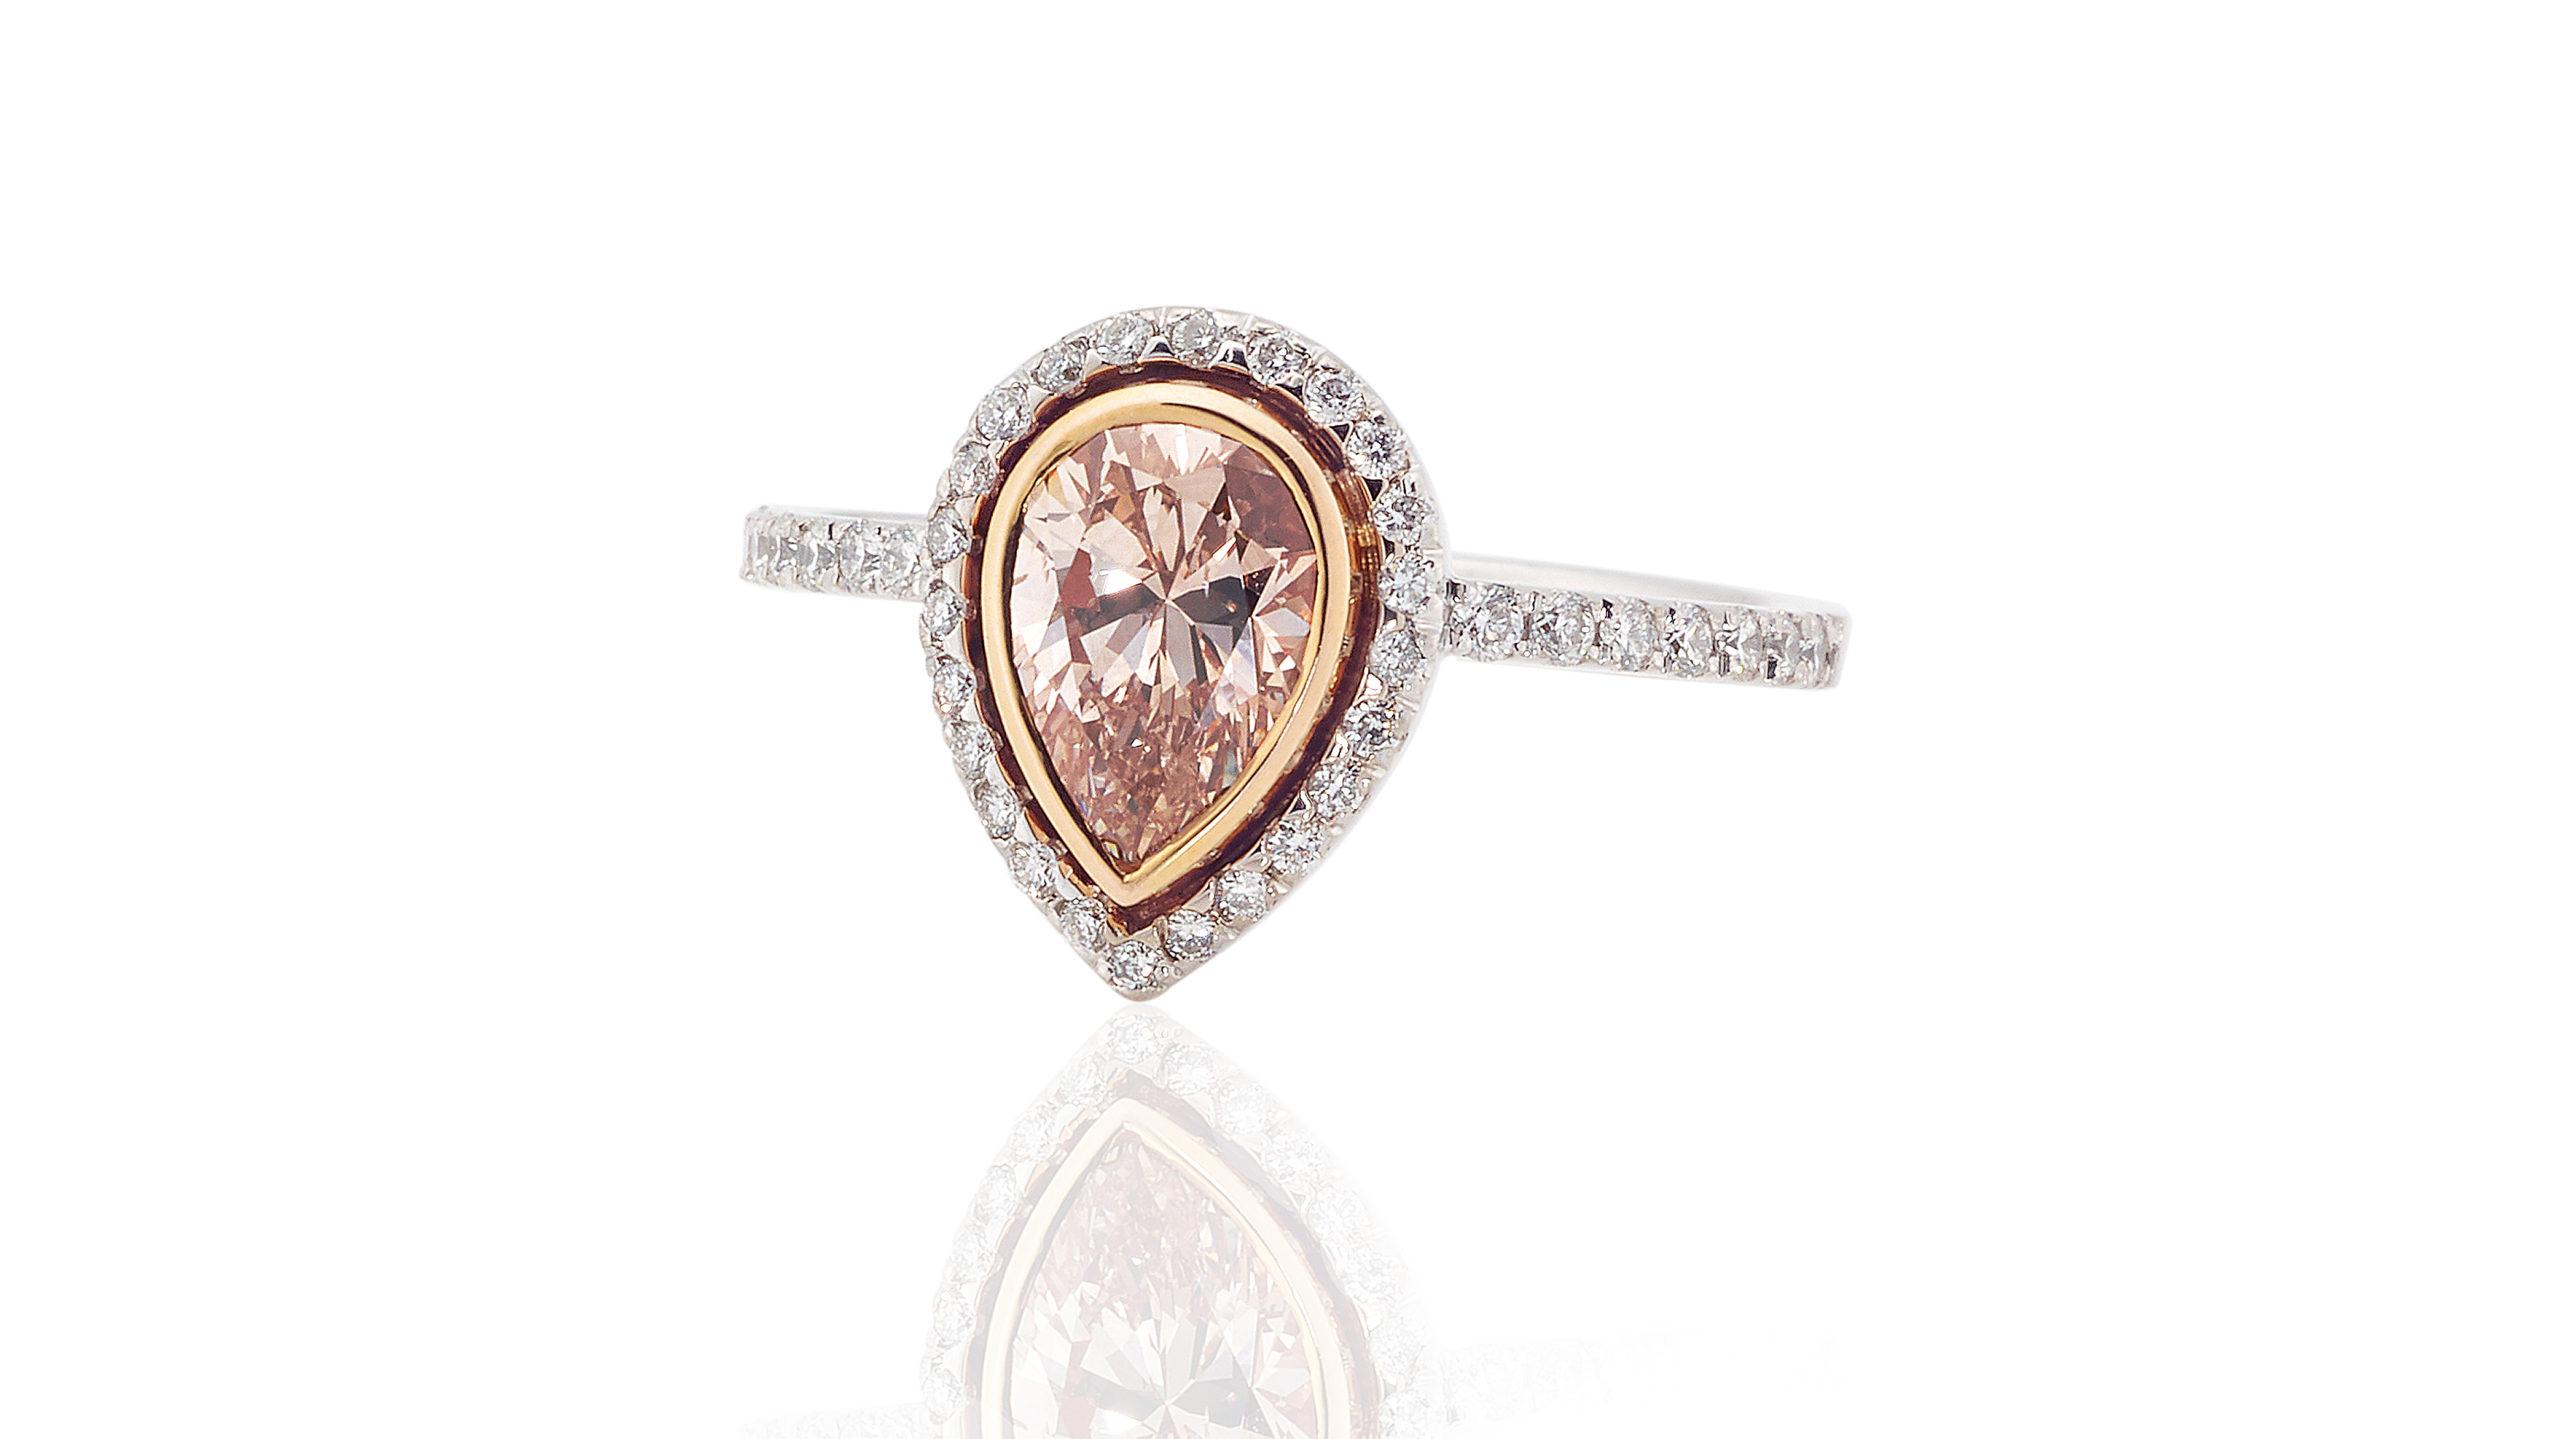 Rsoe Gold Diamond Halo Ring